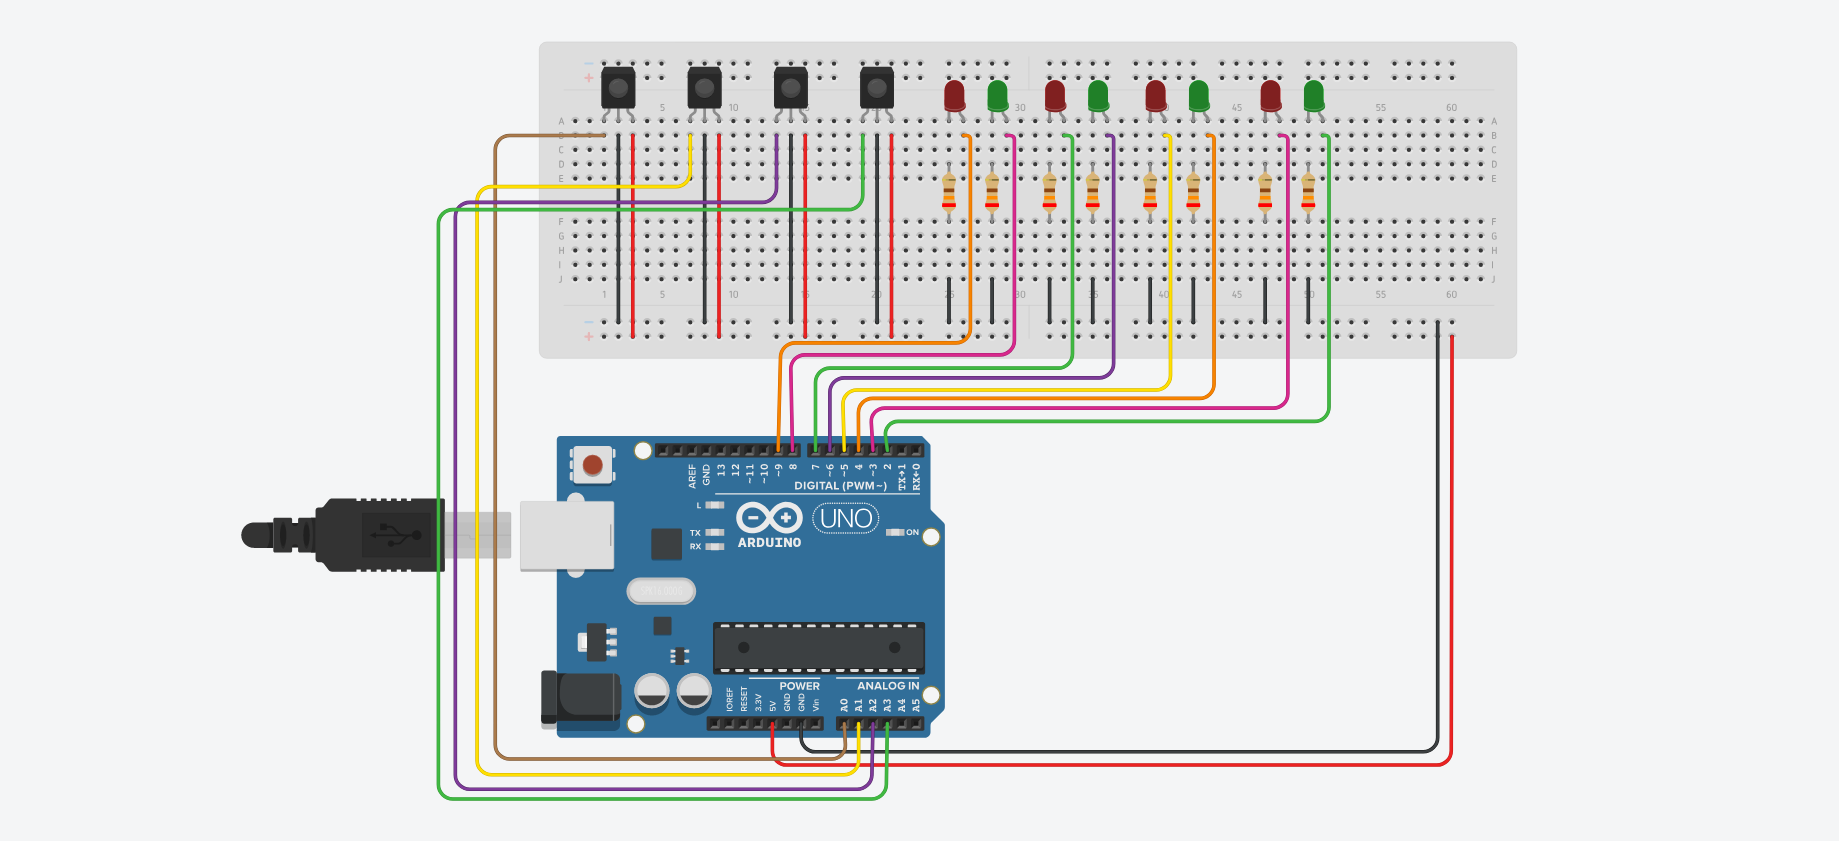 Circuito Io : Dancing robot made with circuito example projects circuito